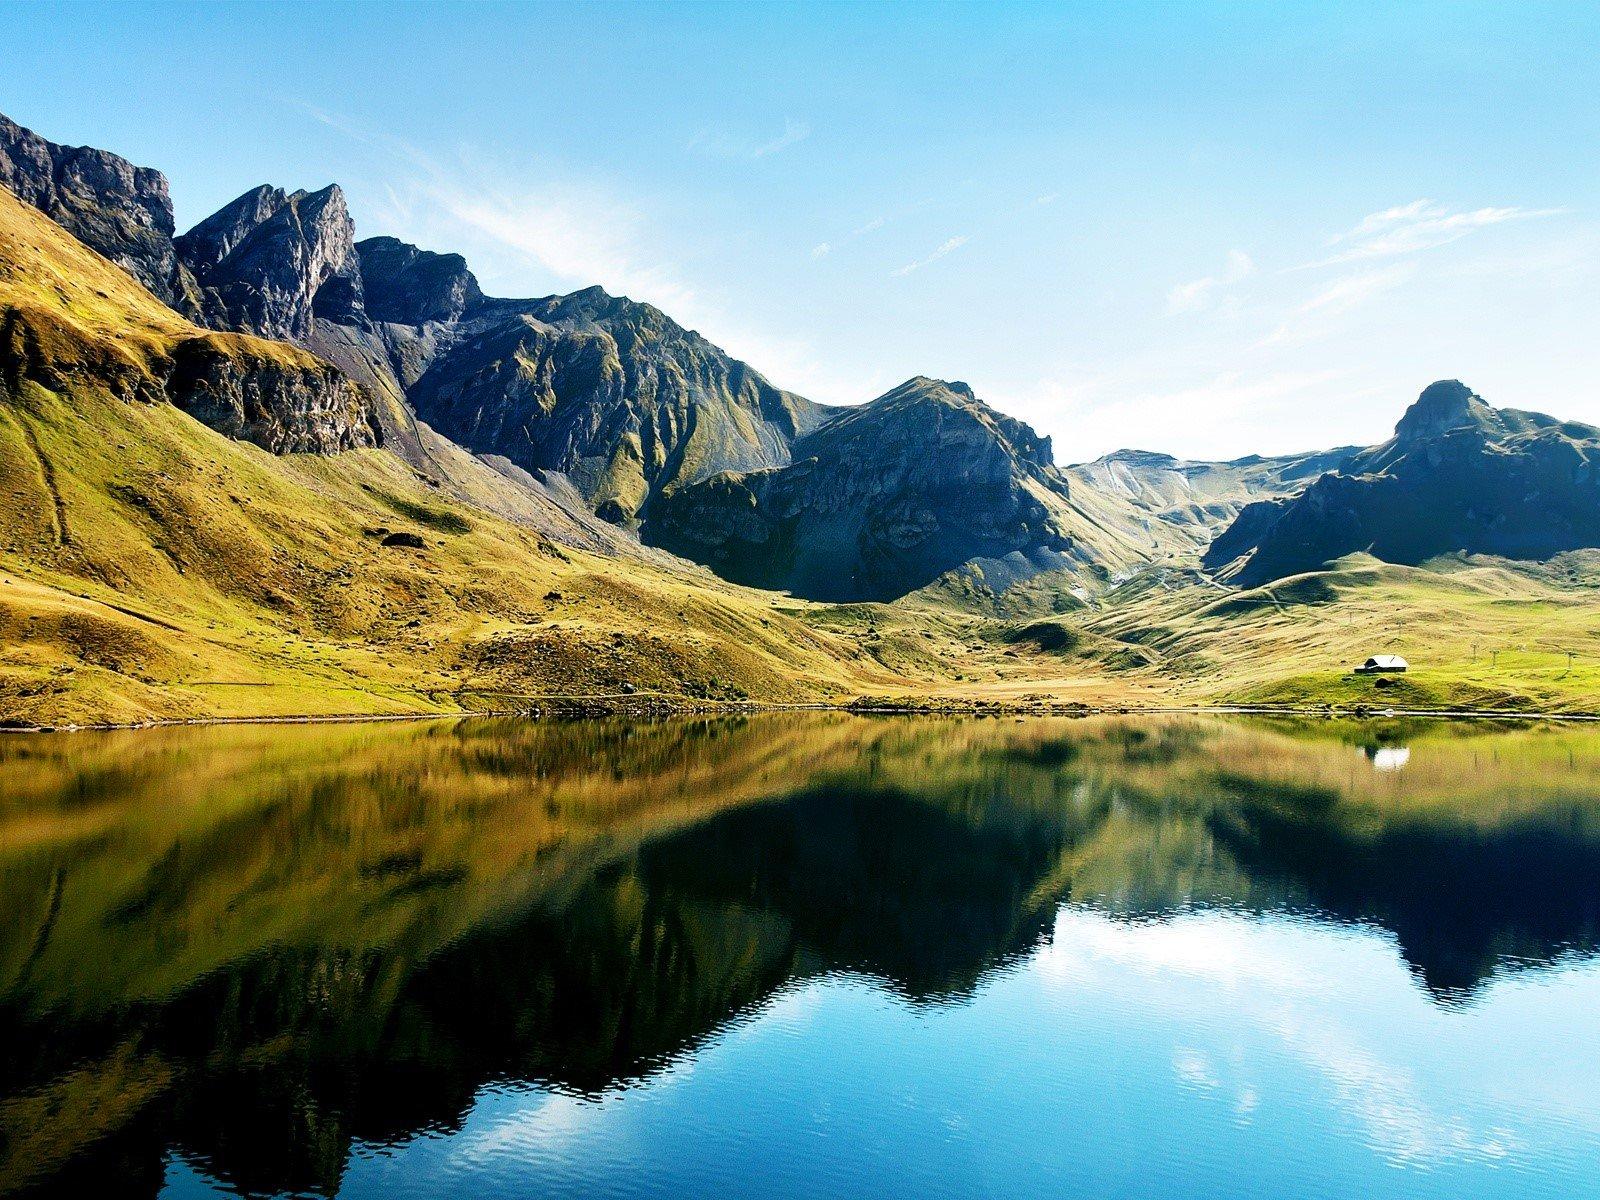 Wallpaper Lake in Switzerland